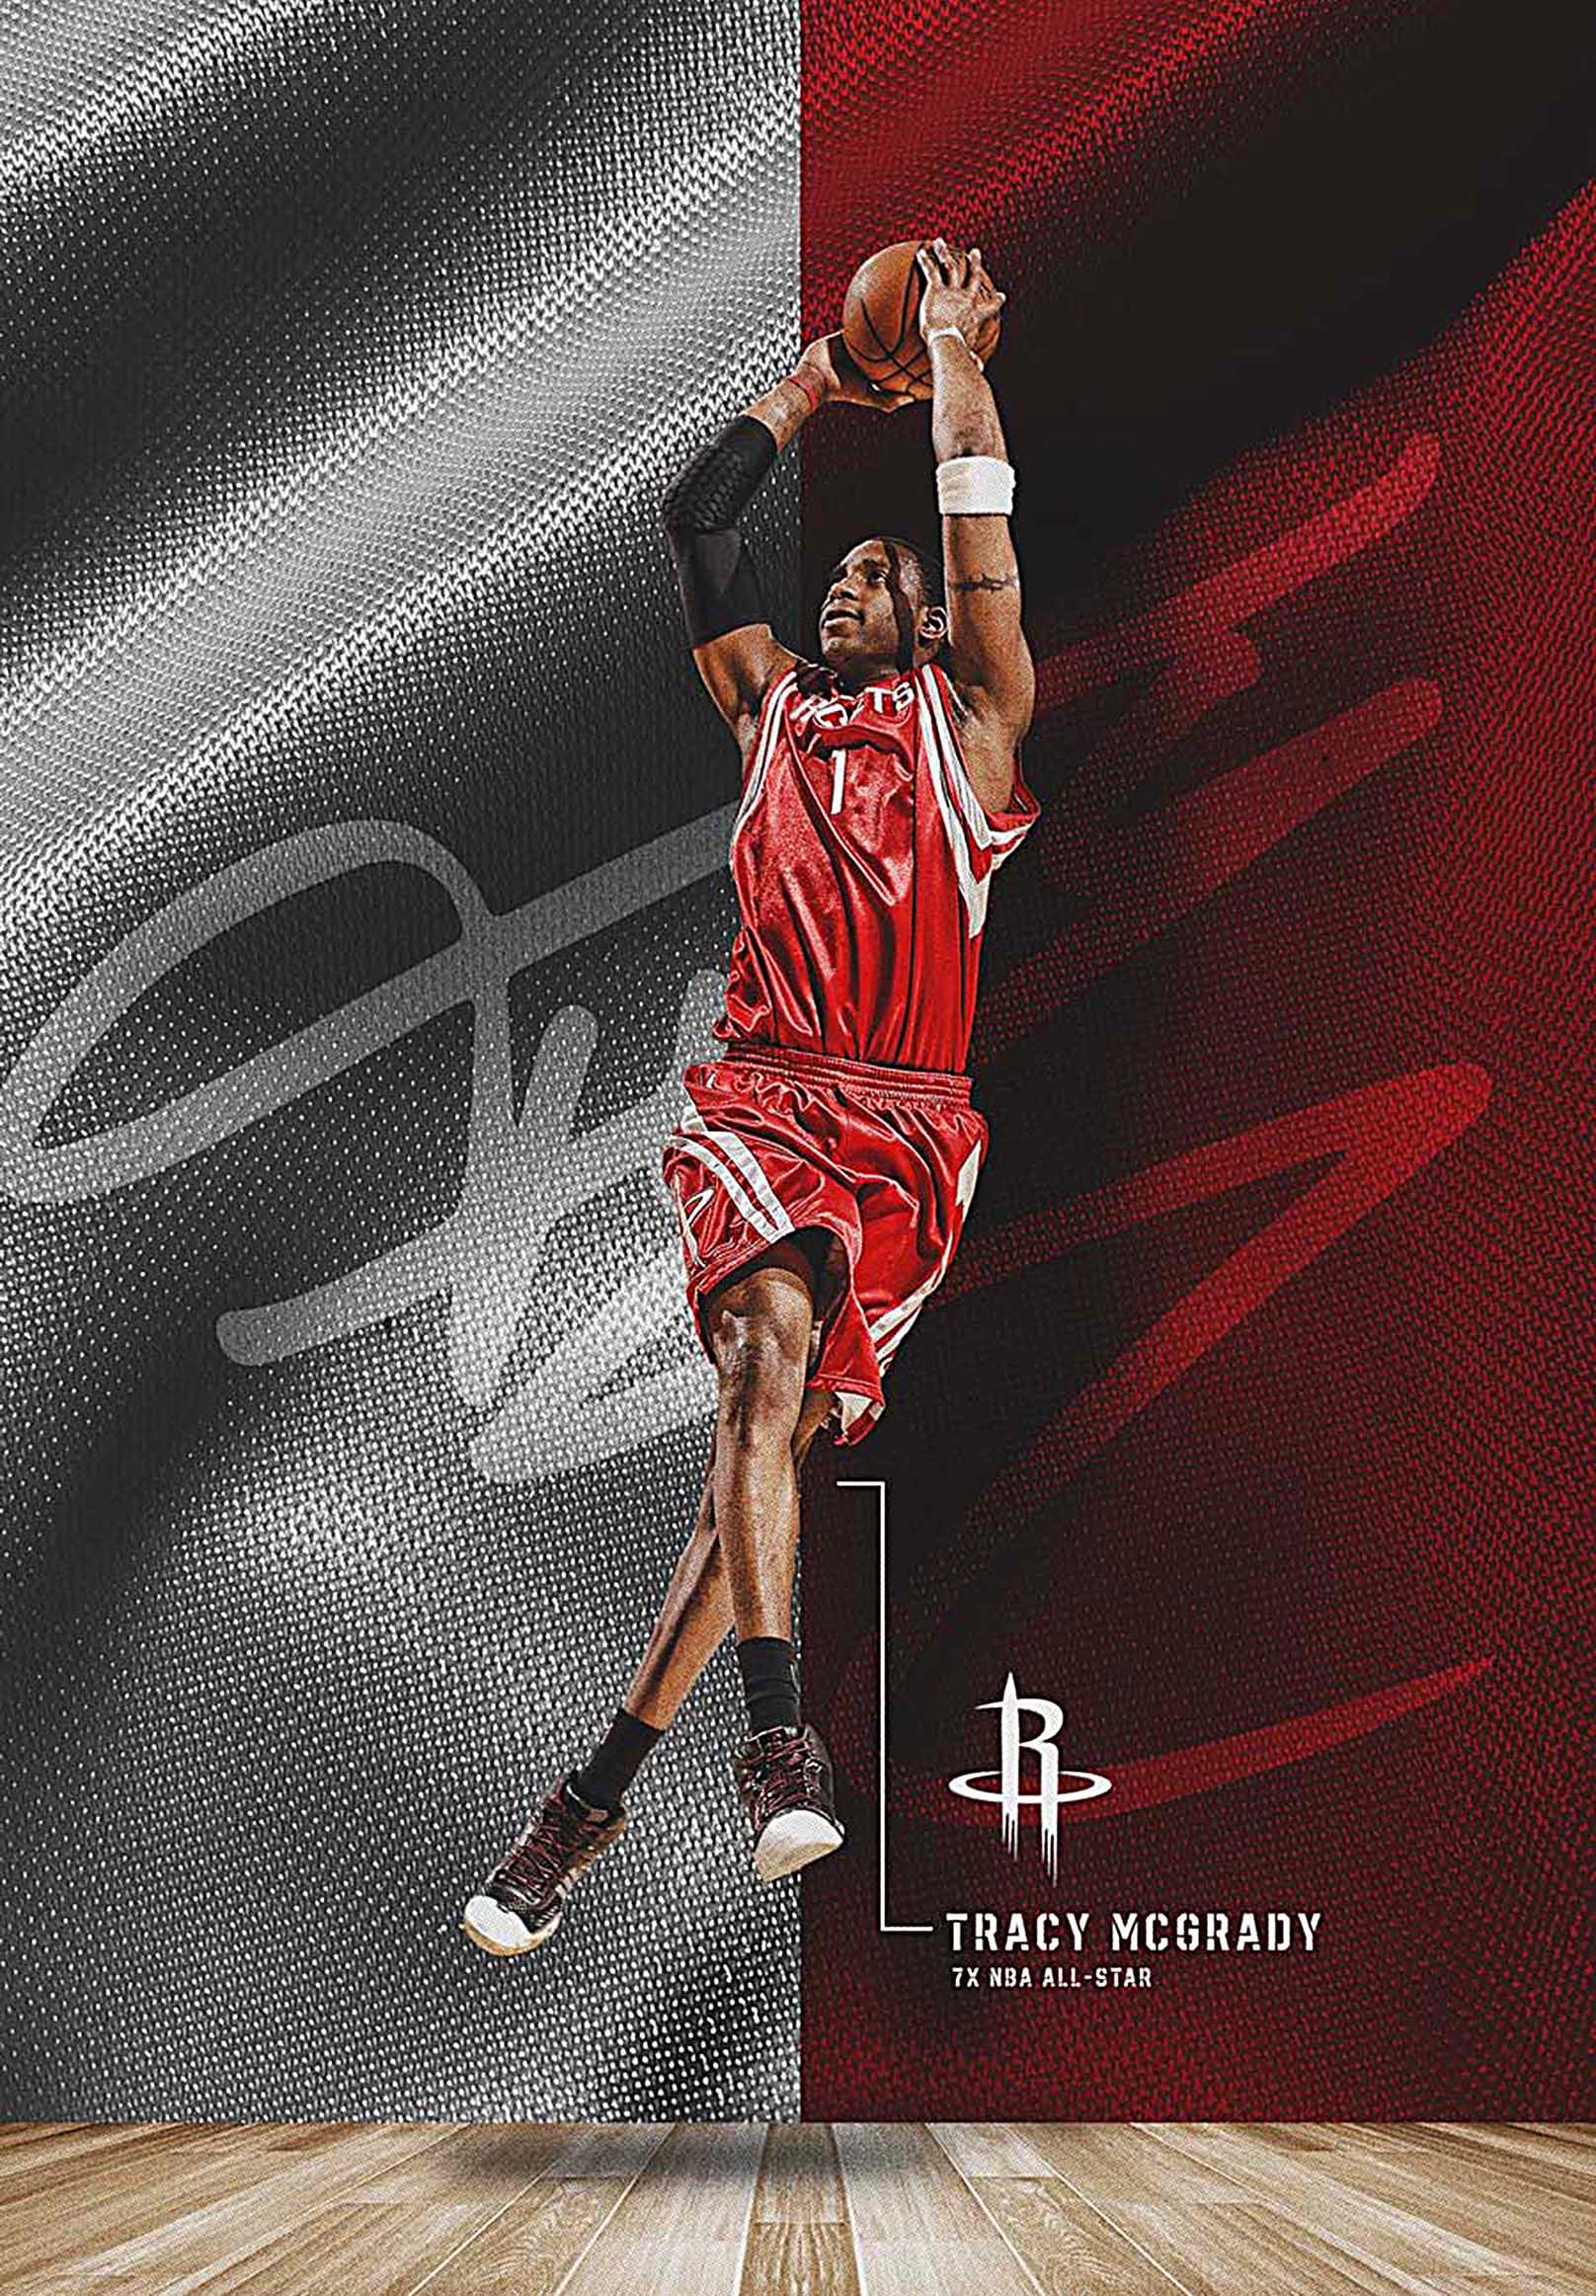 Houston Rockets Tracy McGrady  Canvas Tablo (Nba-canvas-TracyMcGrady)